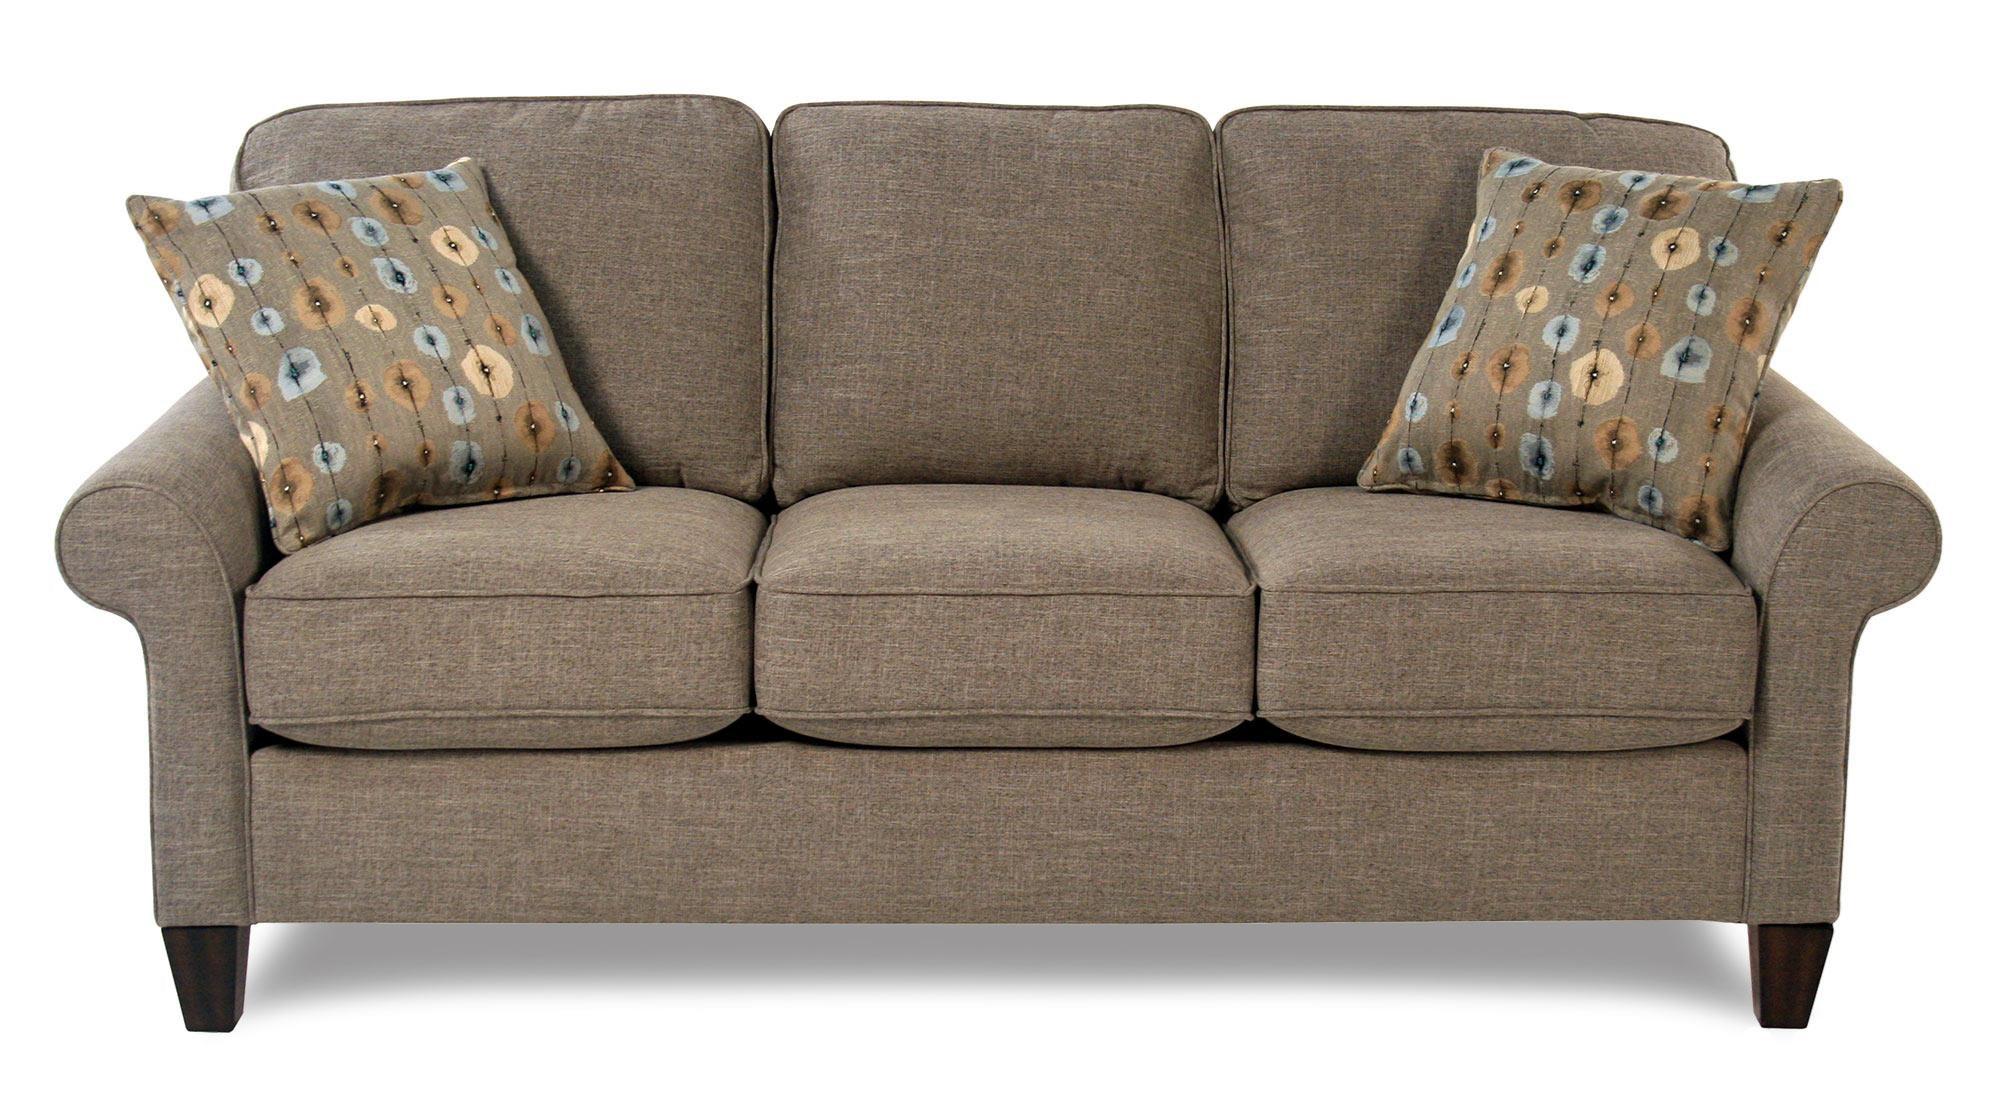 Flexsteel Tanzy Casual Style Sofa Rotmans Sofas